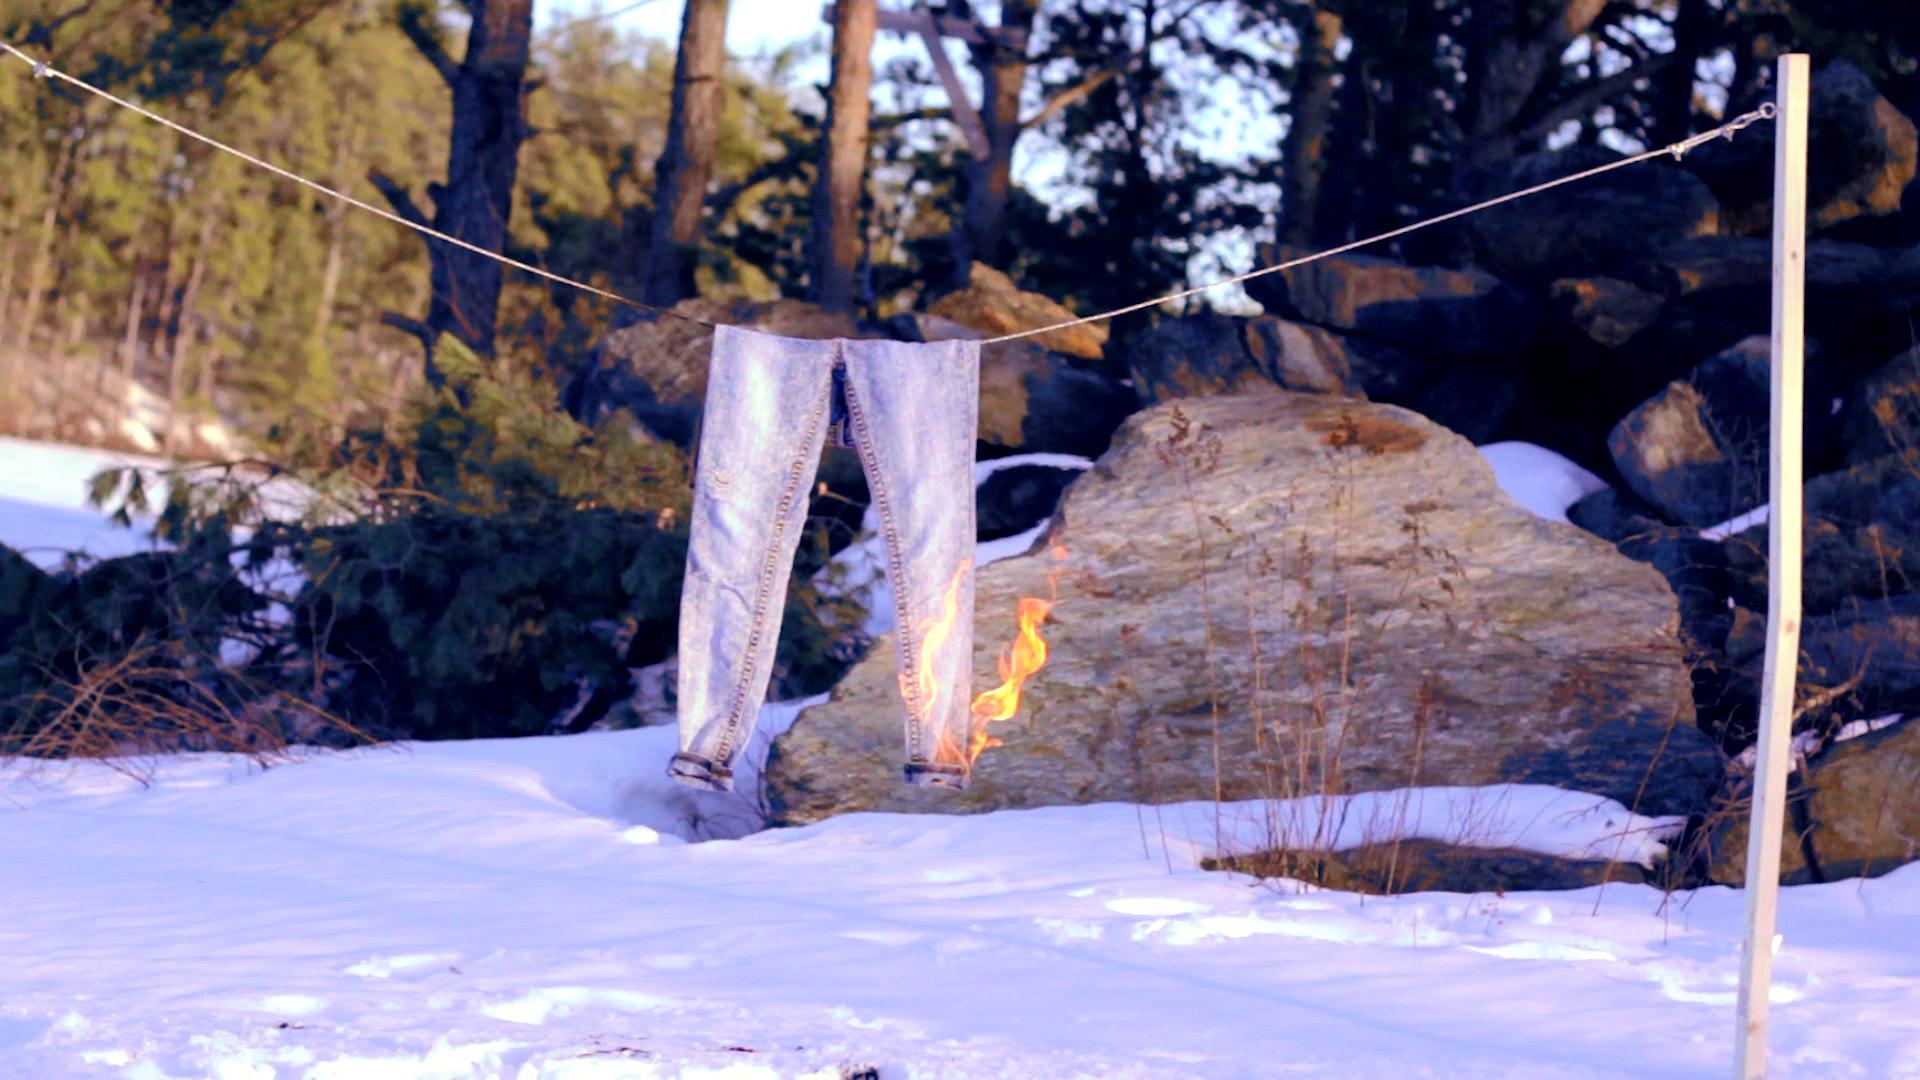 Geena Matuson's (@geenamatuson) multimedia installation 'Liar Liar' (2013). See more @ thegirlmirage.com.